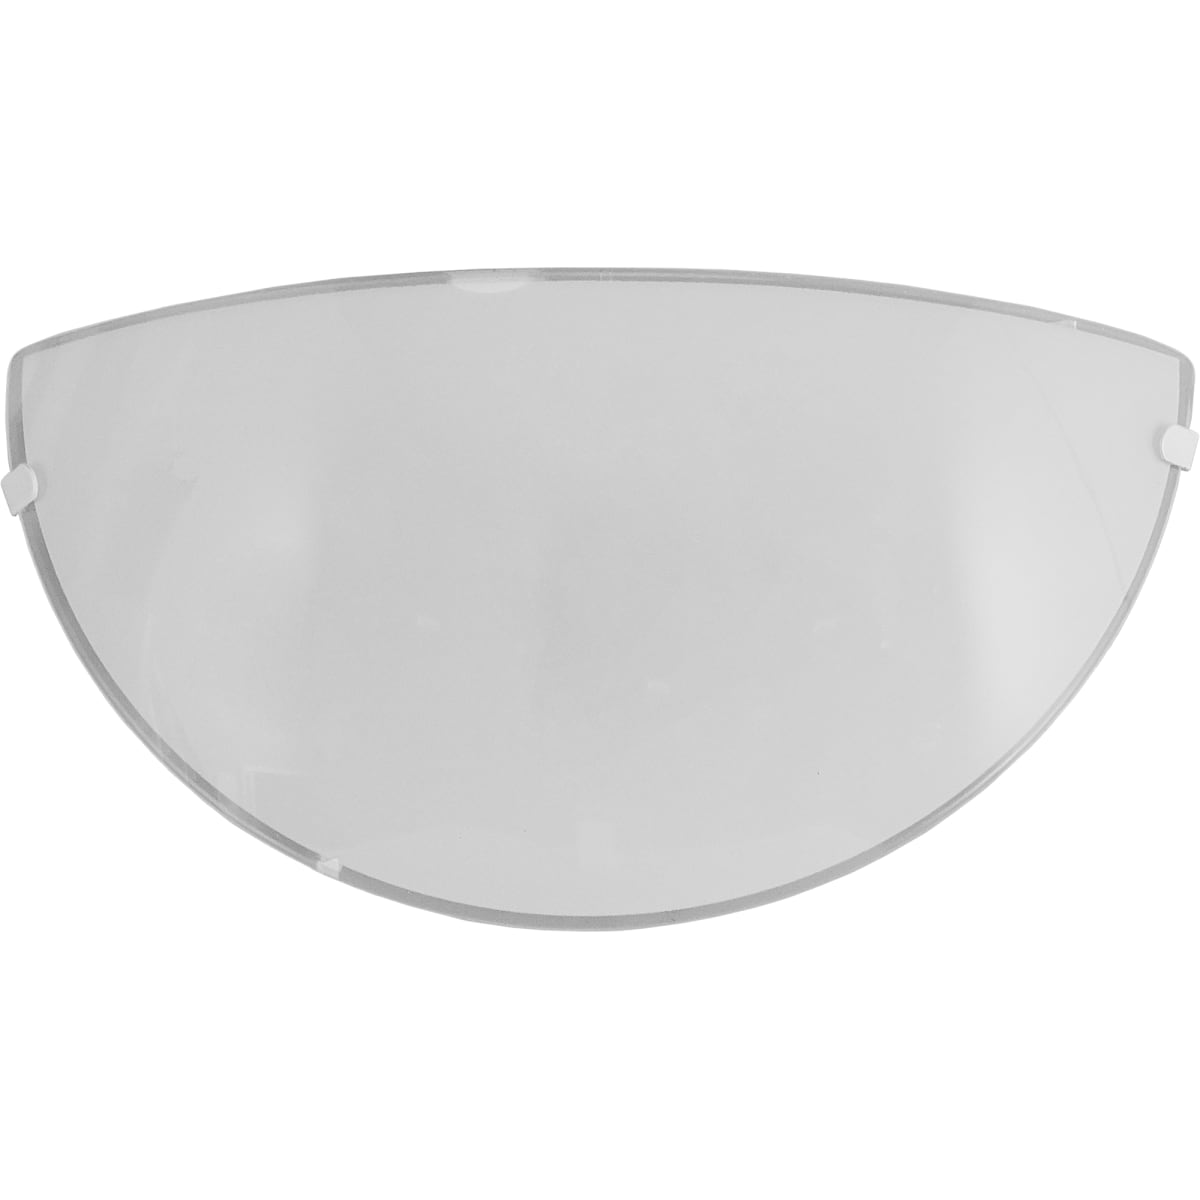 Бра Лайт Мини 1xE27x60 Вт, металл/стекло, цвет хром/белый